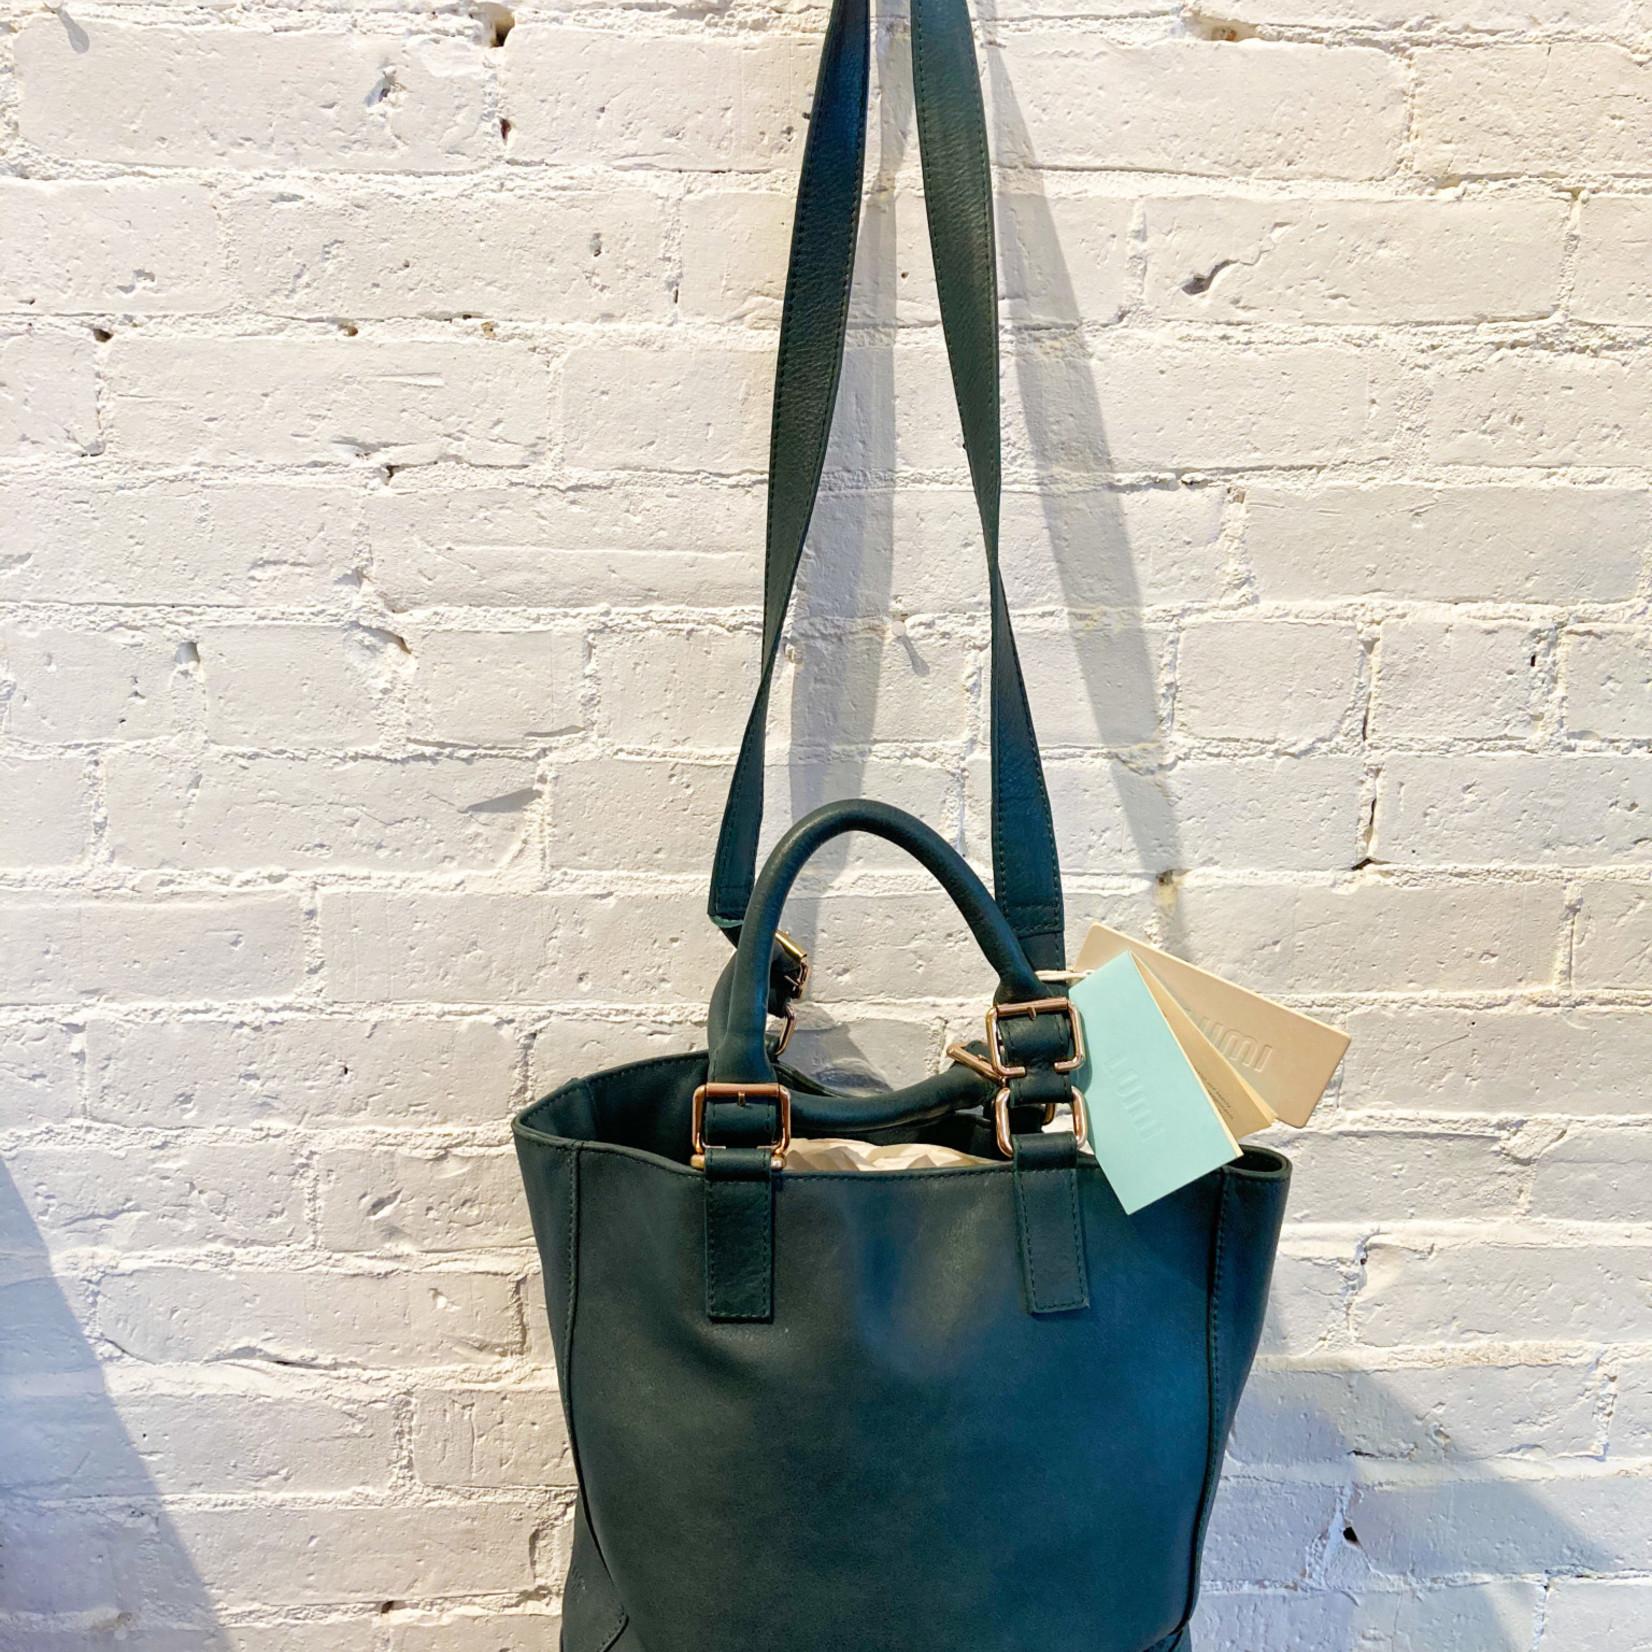 Lumi Tote Bag: Evergreen